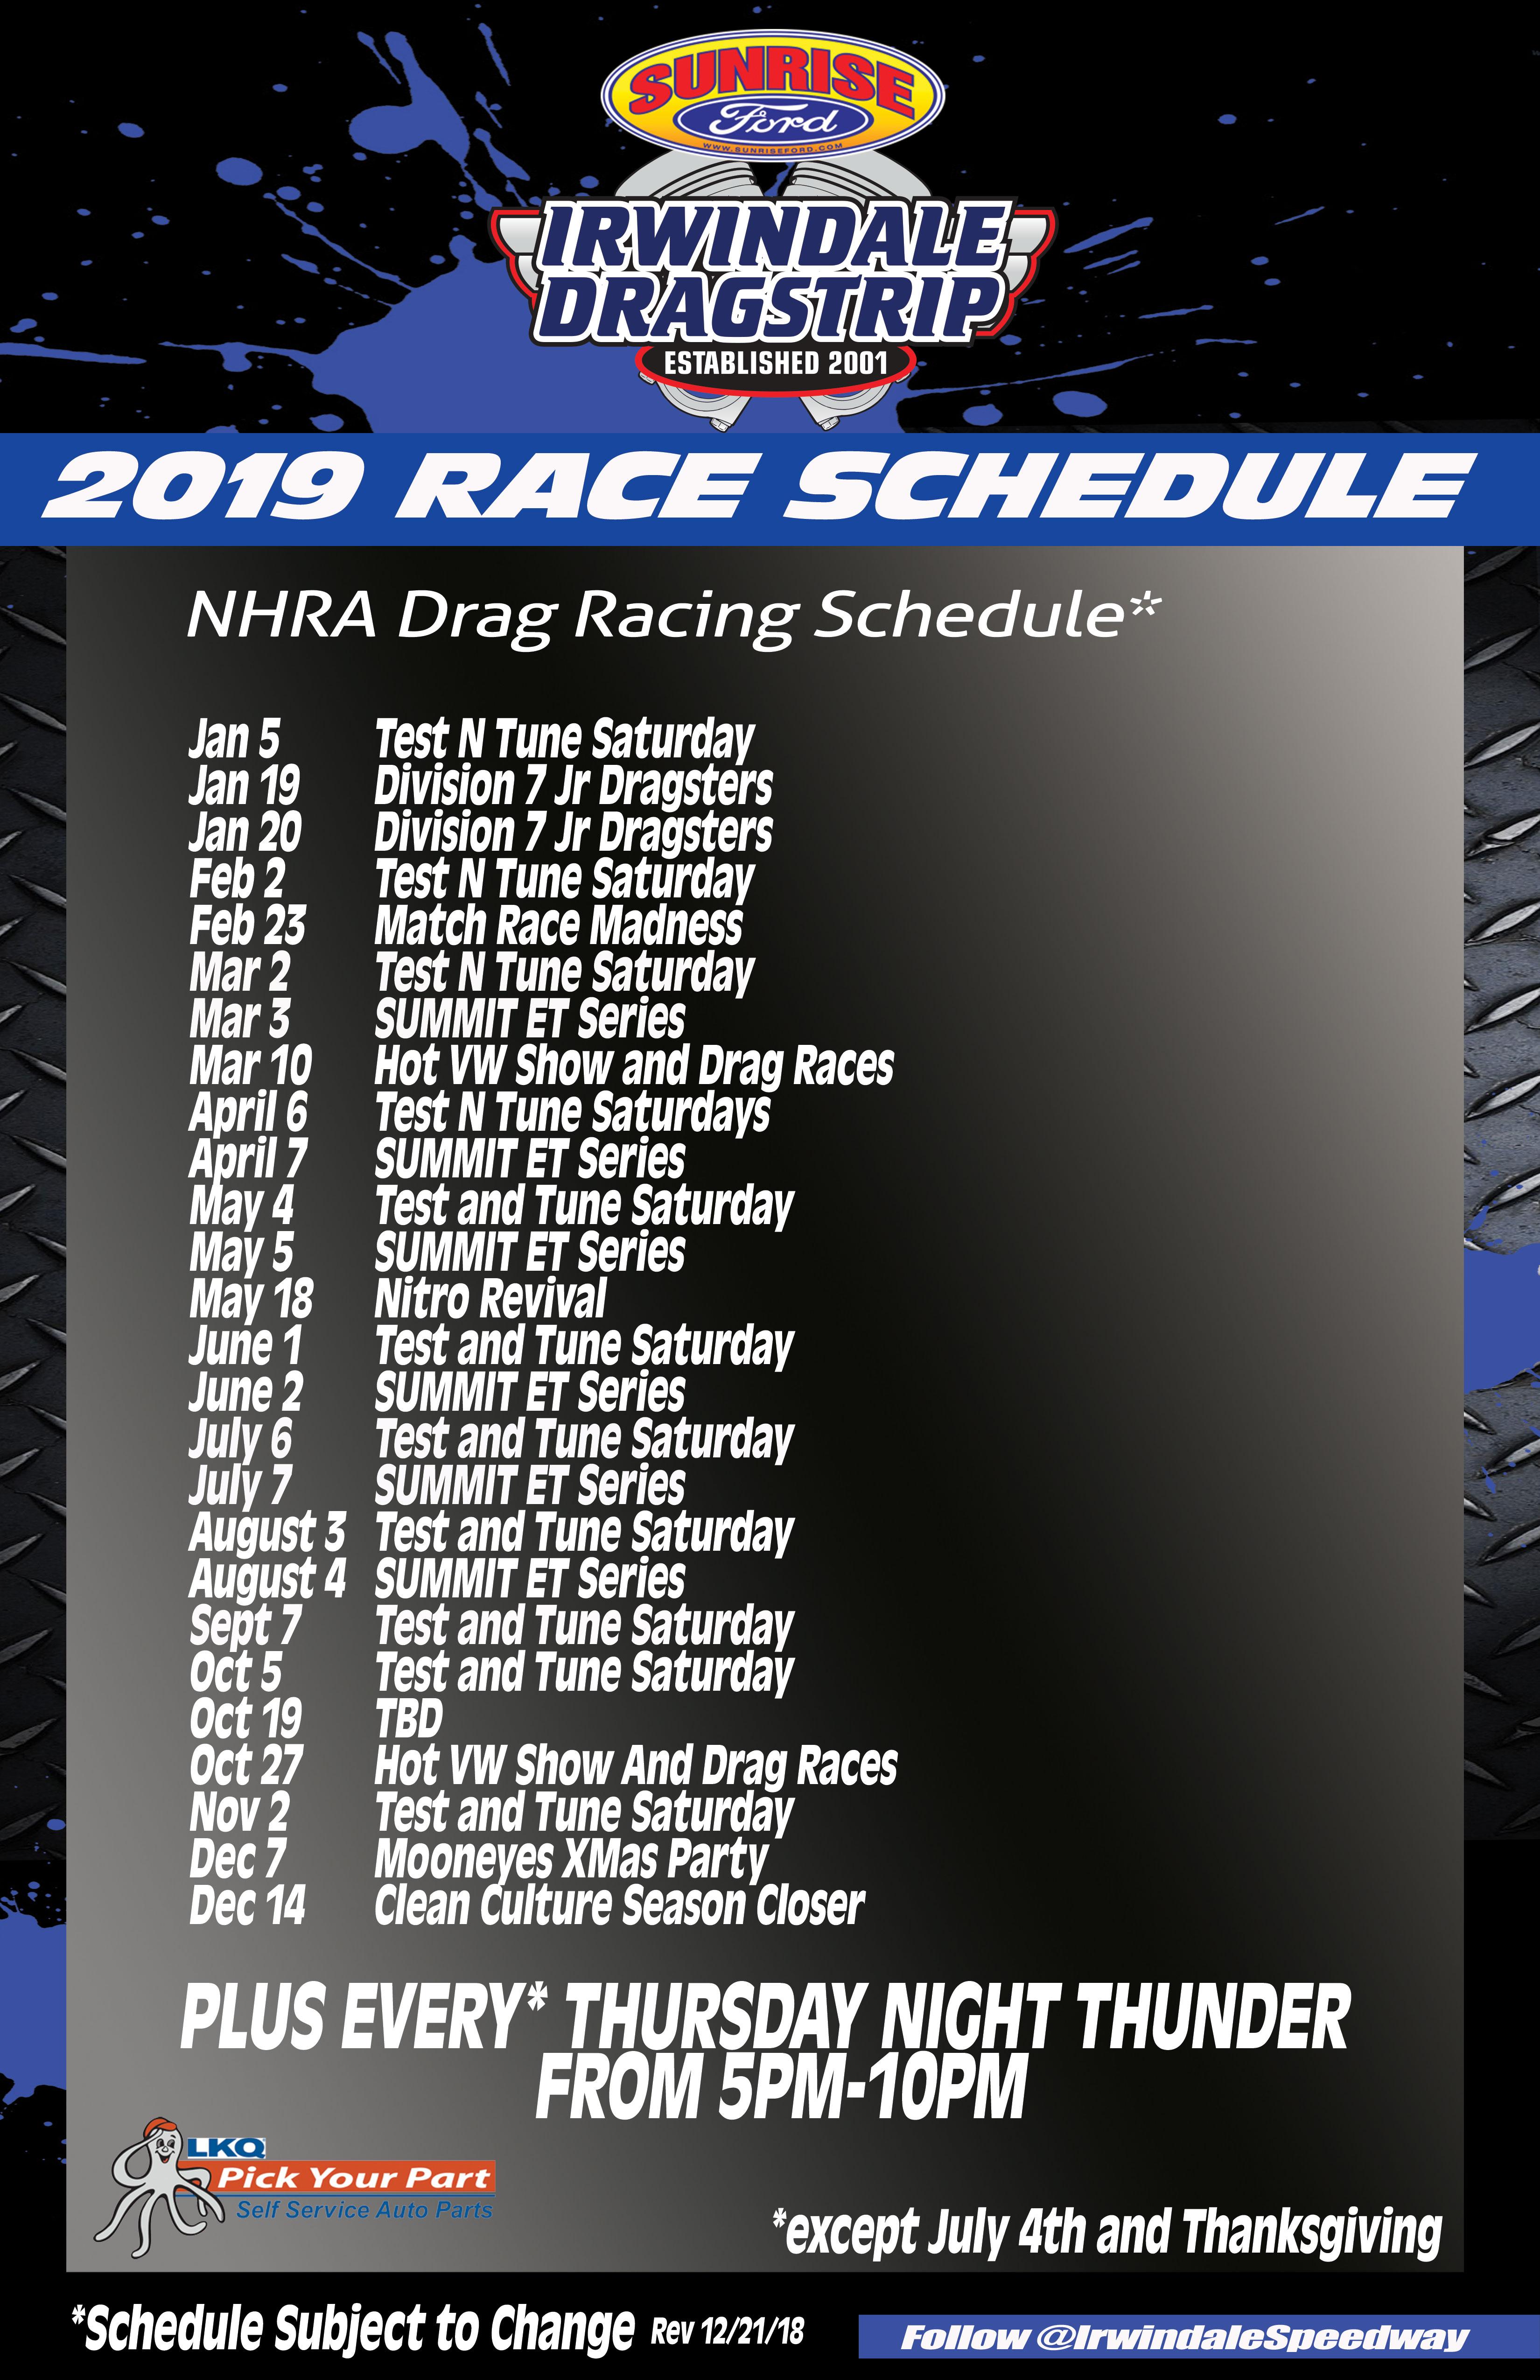 2019 Nhra Schedule Irwindale Speedway and Drag Strip Announces 2019 Schedule